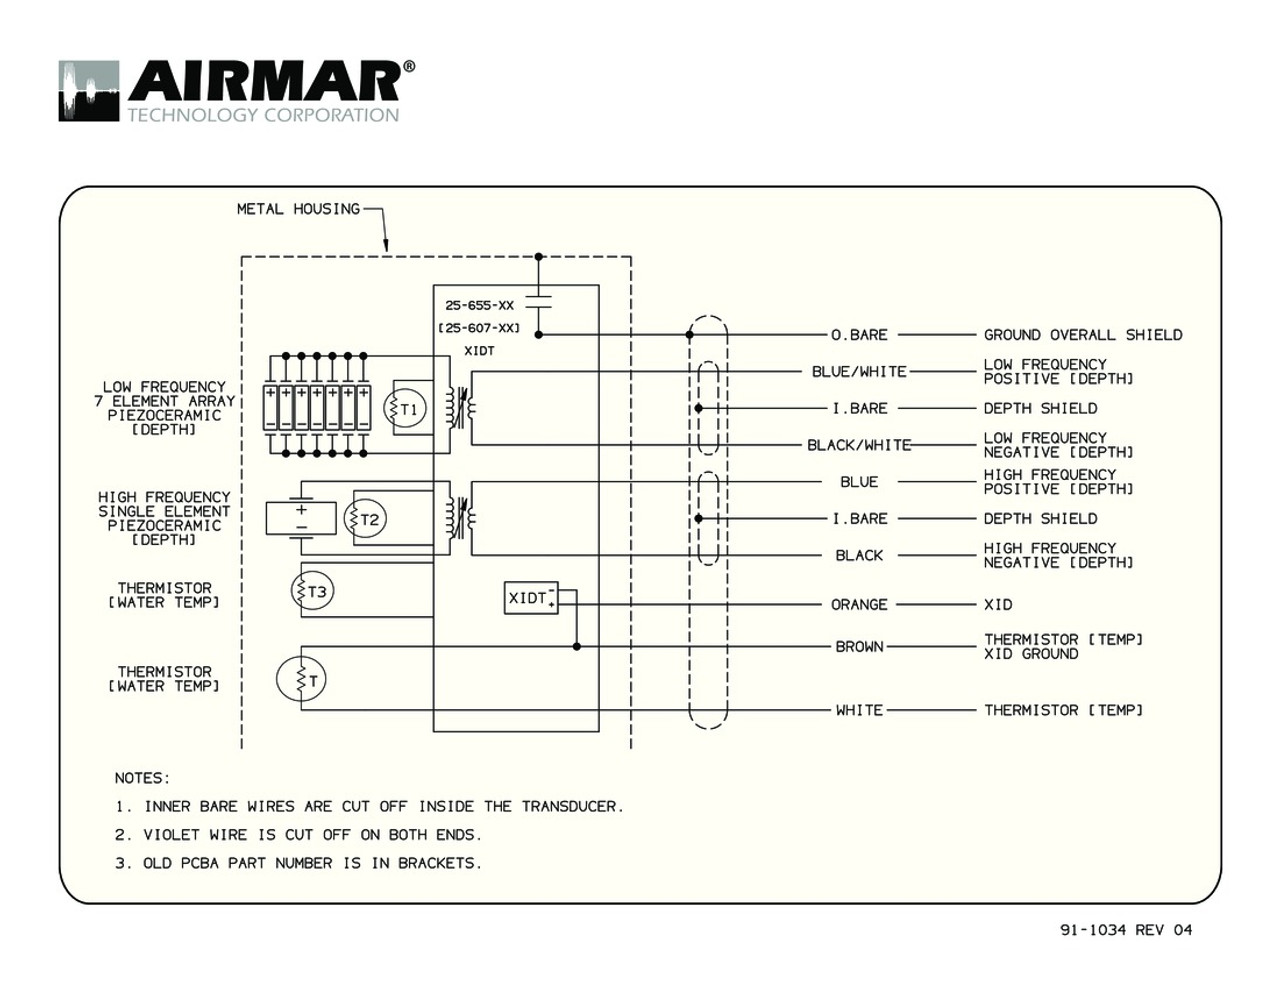 airmar wiring diagram b265 b275 blue bottle marine pressure transducer wiring diagram b265c lh  [ 1280 x 989 Pixel ]